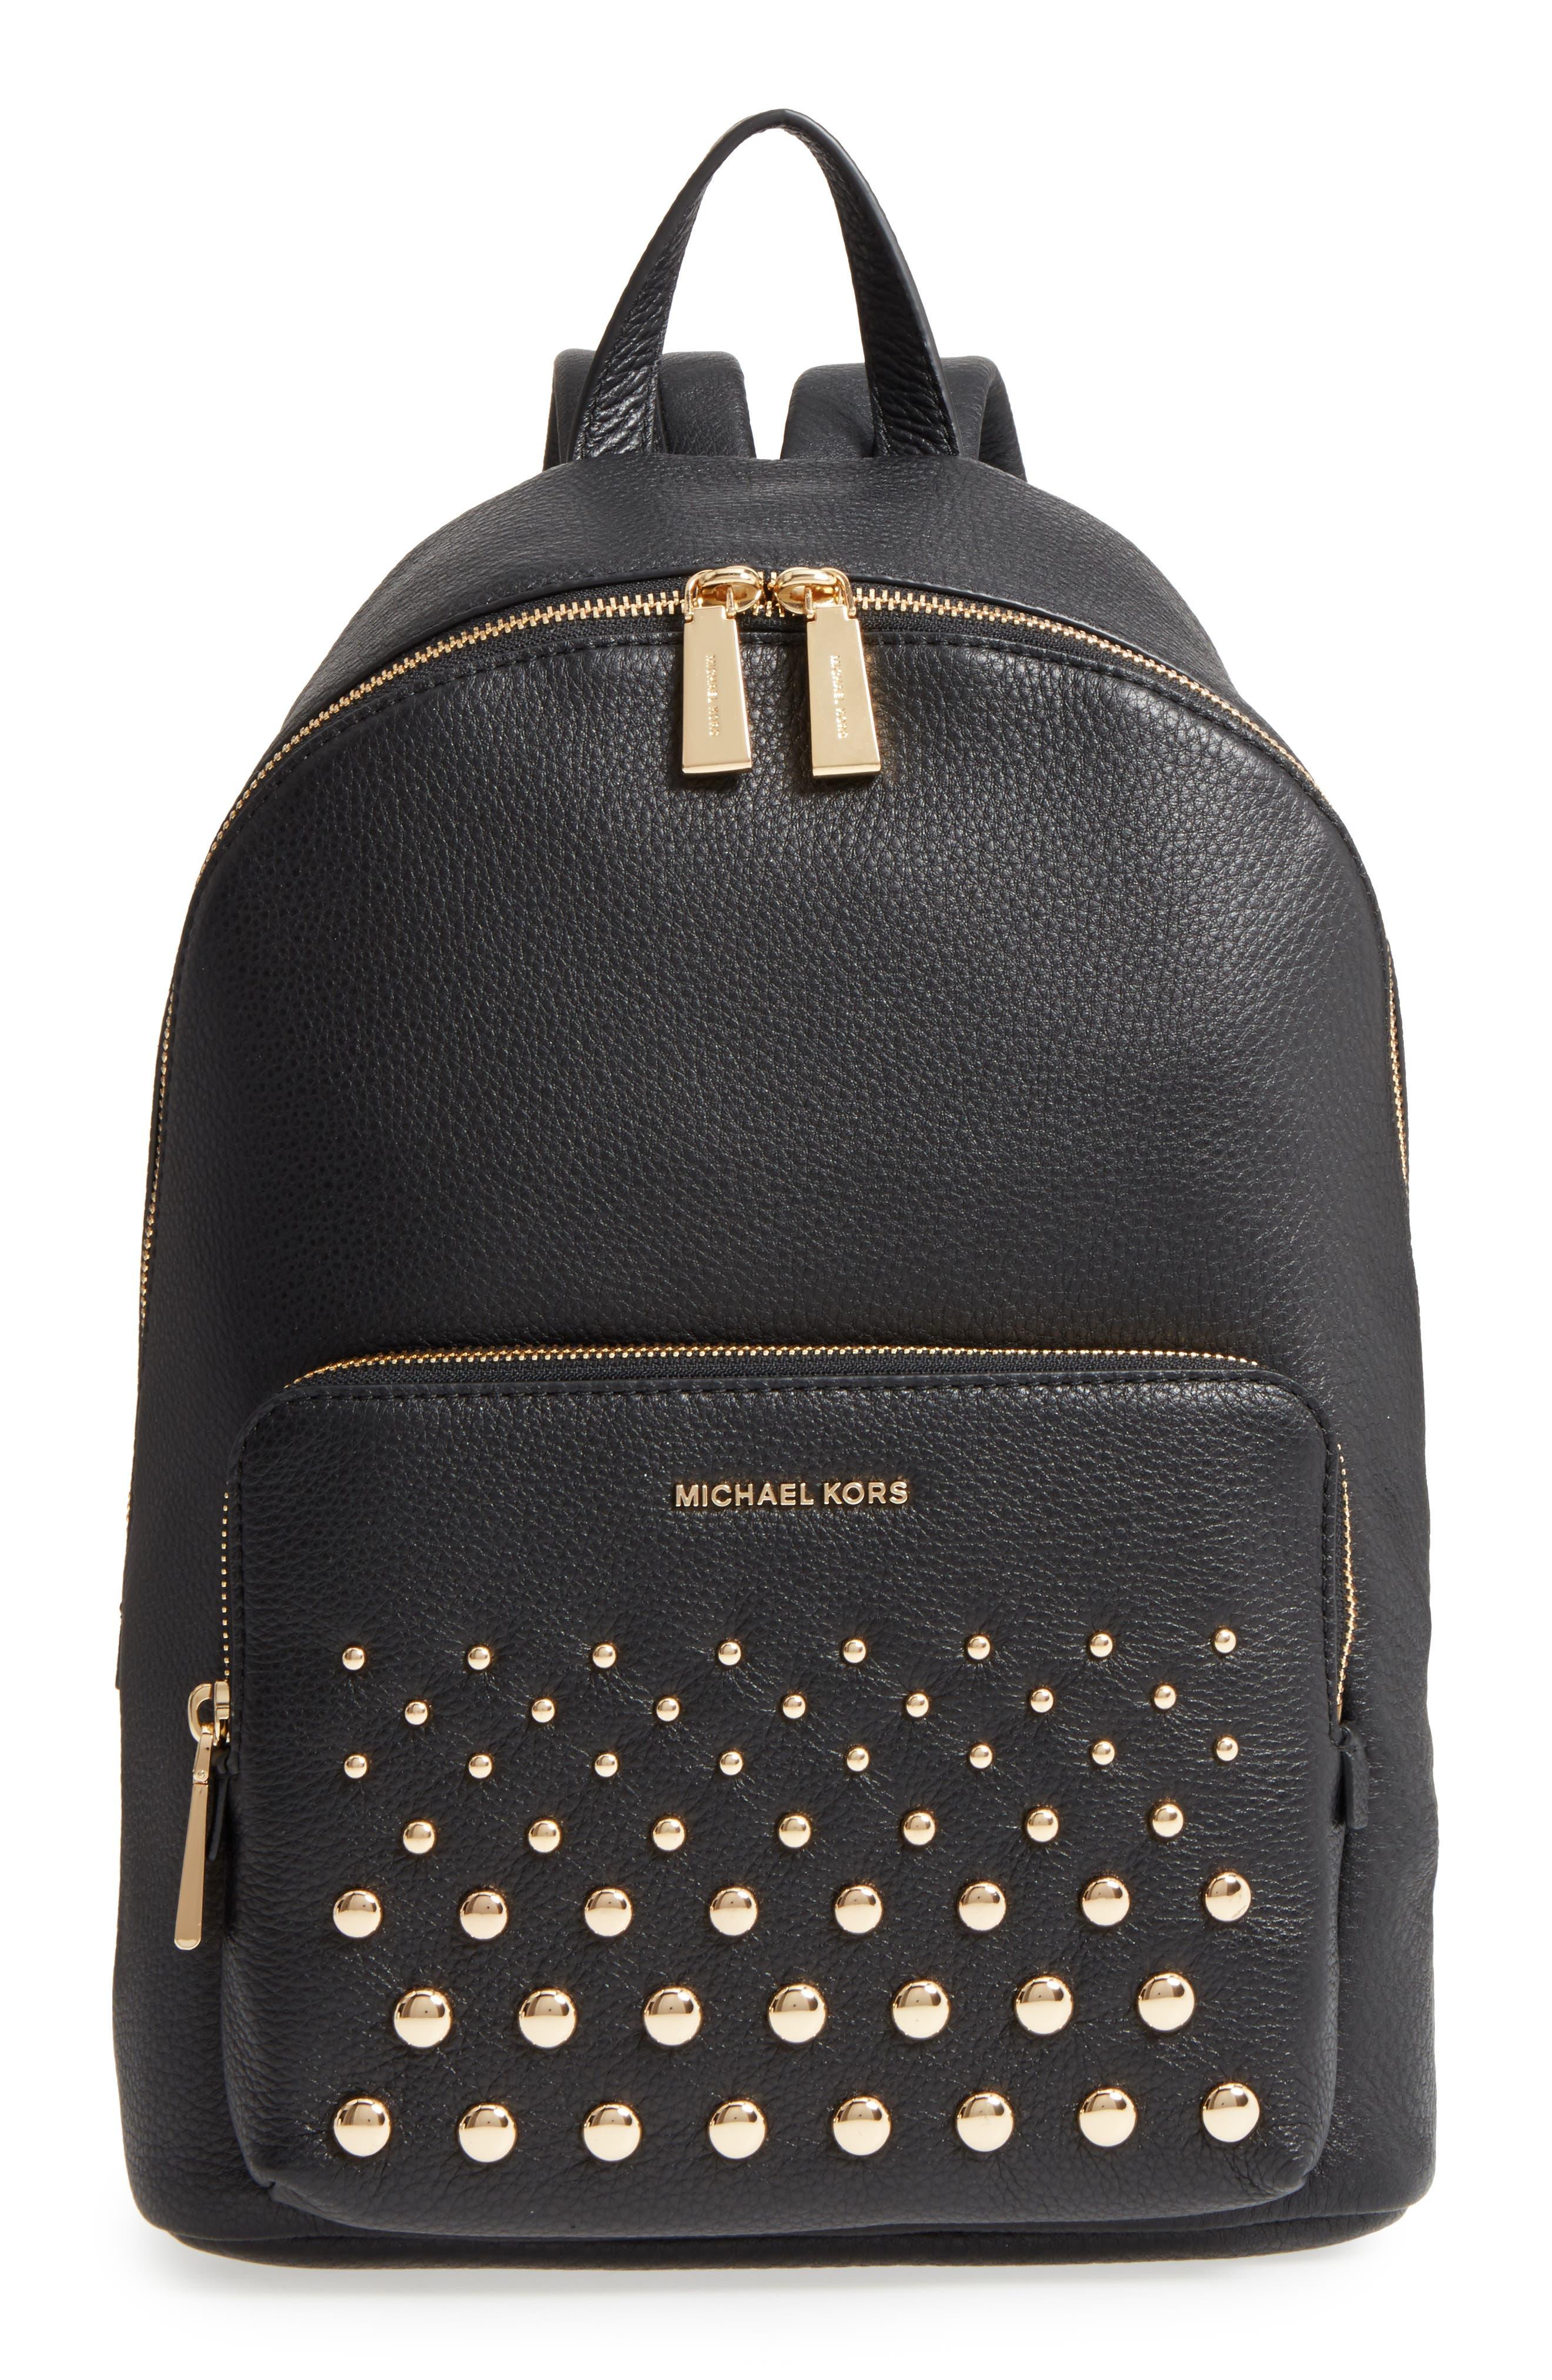 Main Image - Michael Kors Large Wythe Studded Leather Backpack